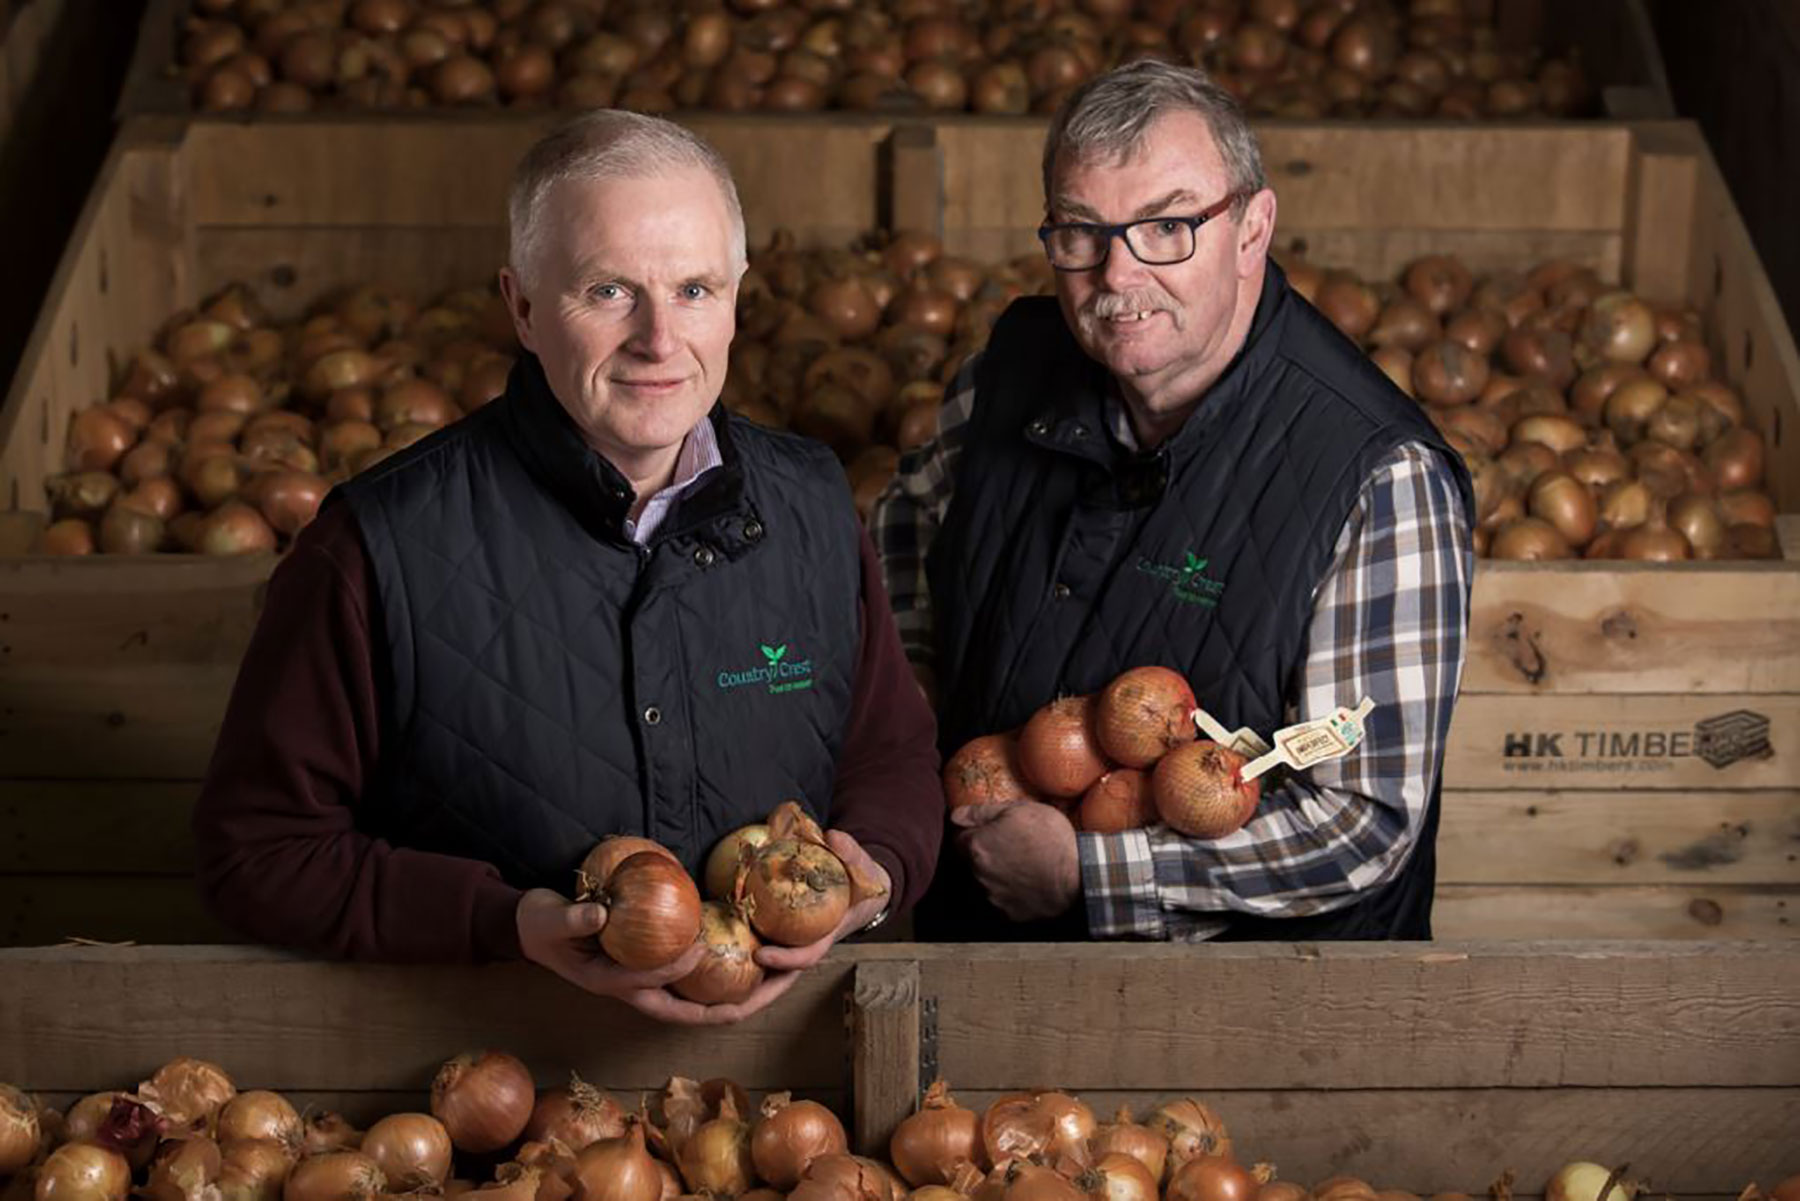 Gabriel-and-Tony-onions